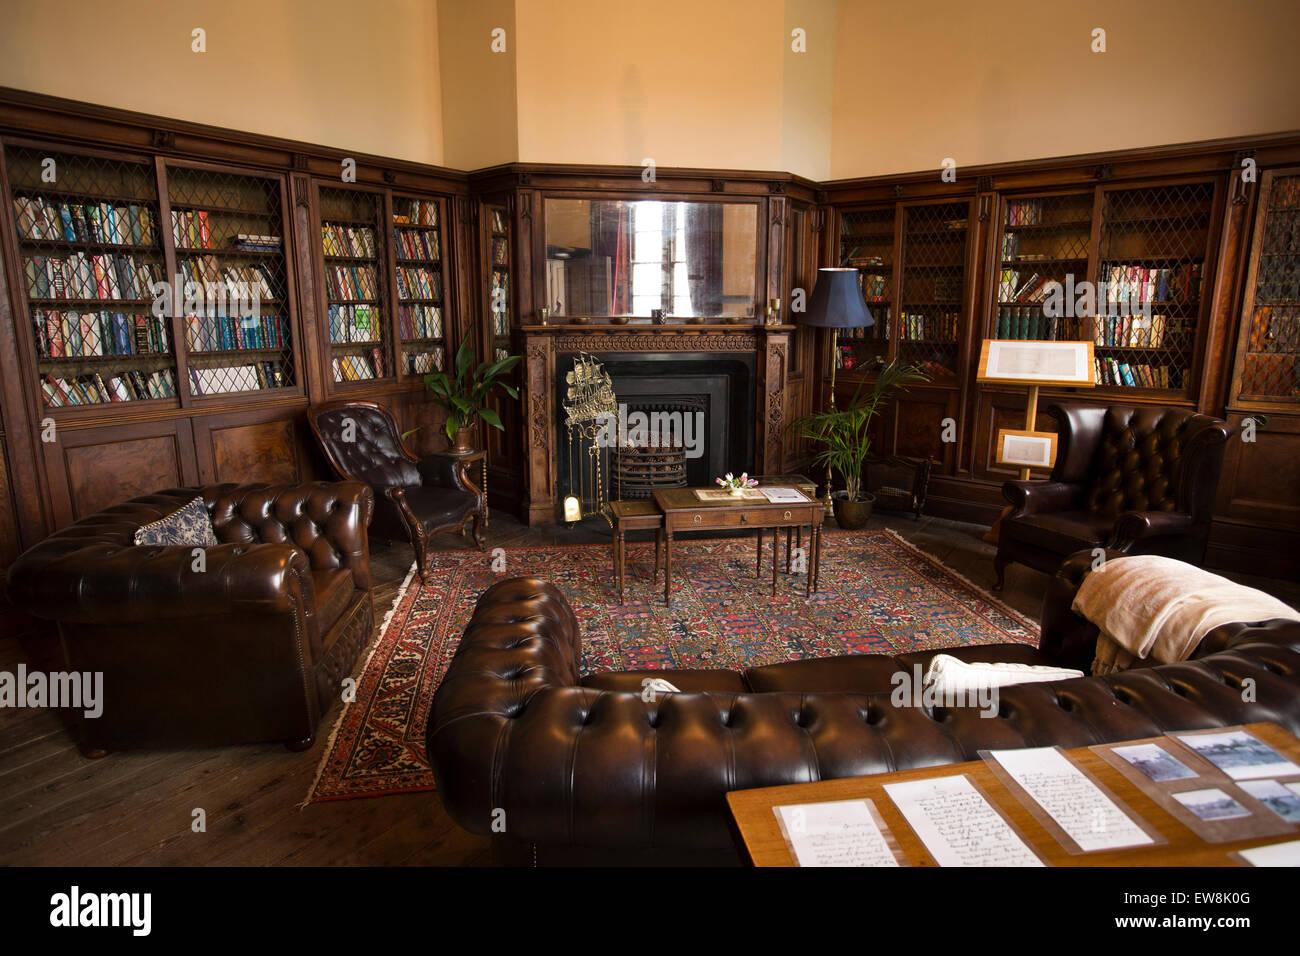 Irland, Co. Wexford, Ballyedmond, Brunnen Haus, Bibliothek Stockfoto ...